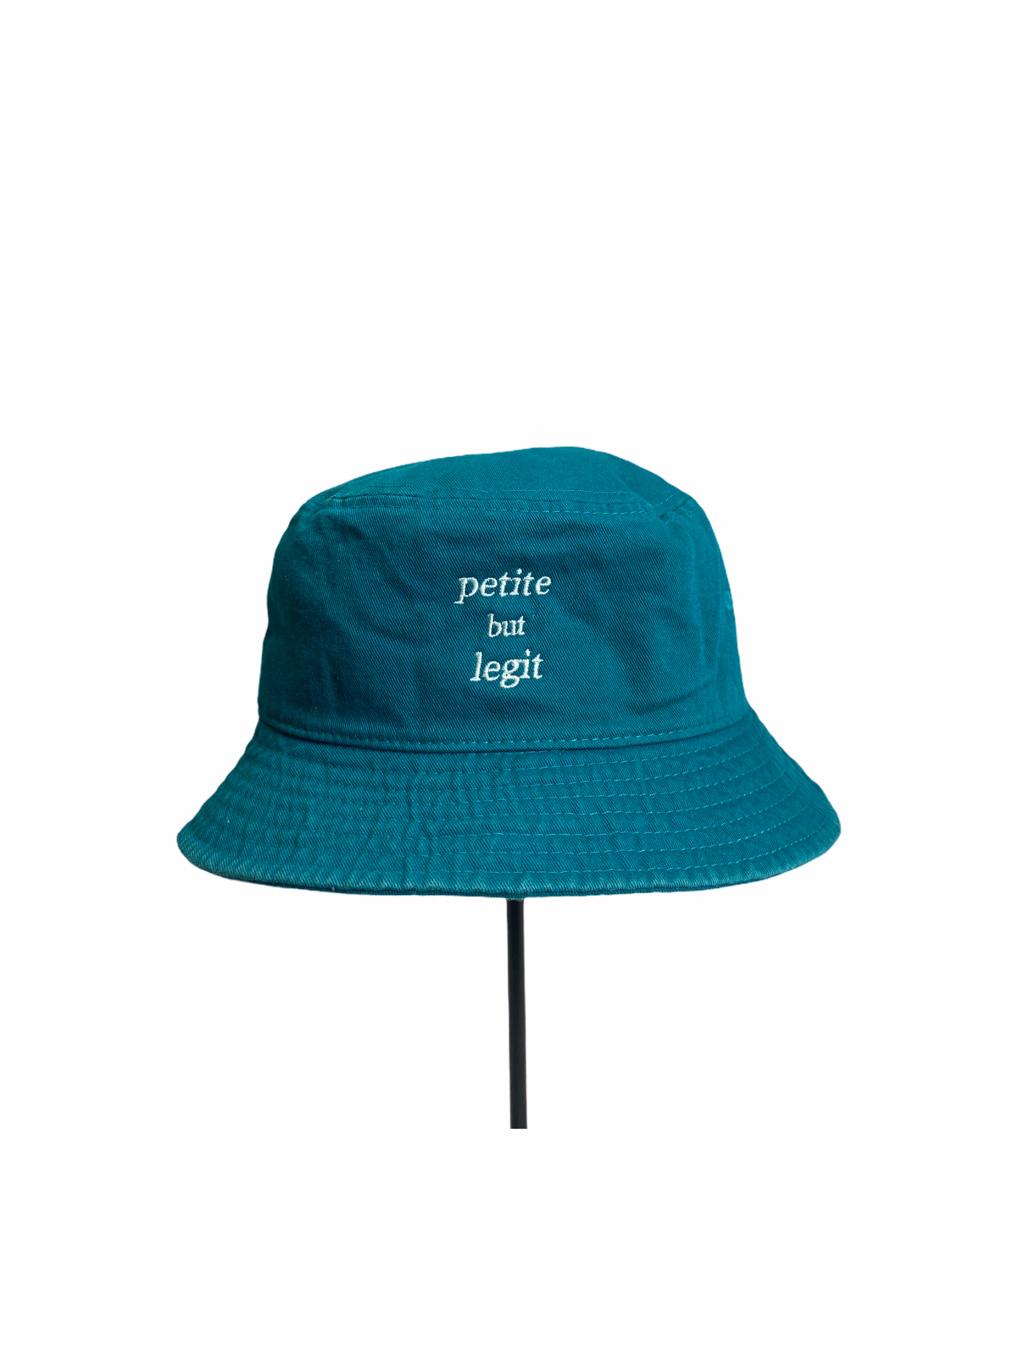 Petite But Legit Bucket Hat (Teal)